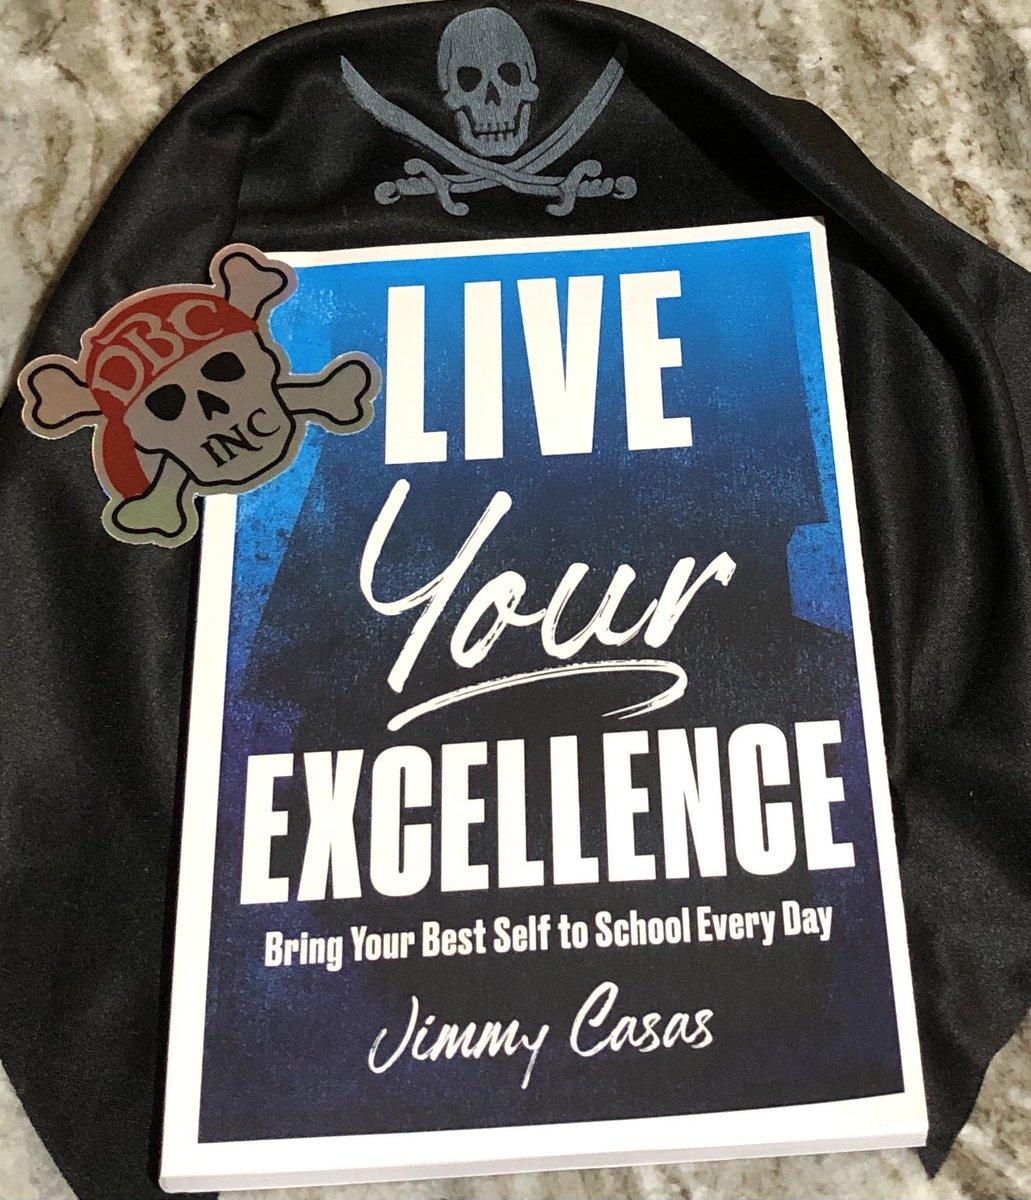 Thank you @dbc_inc for this amazing book! #dbcincbooks @casas_jimmy